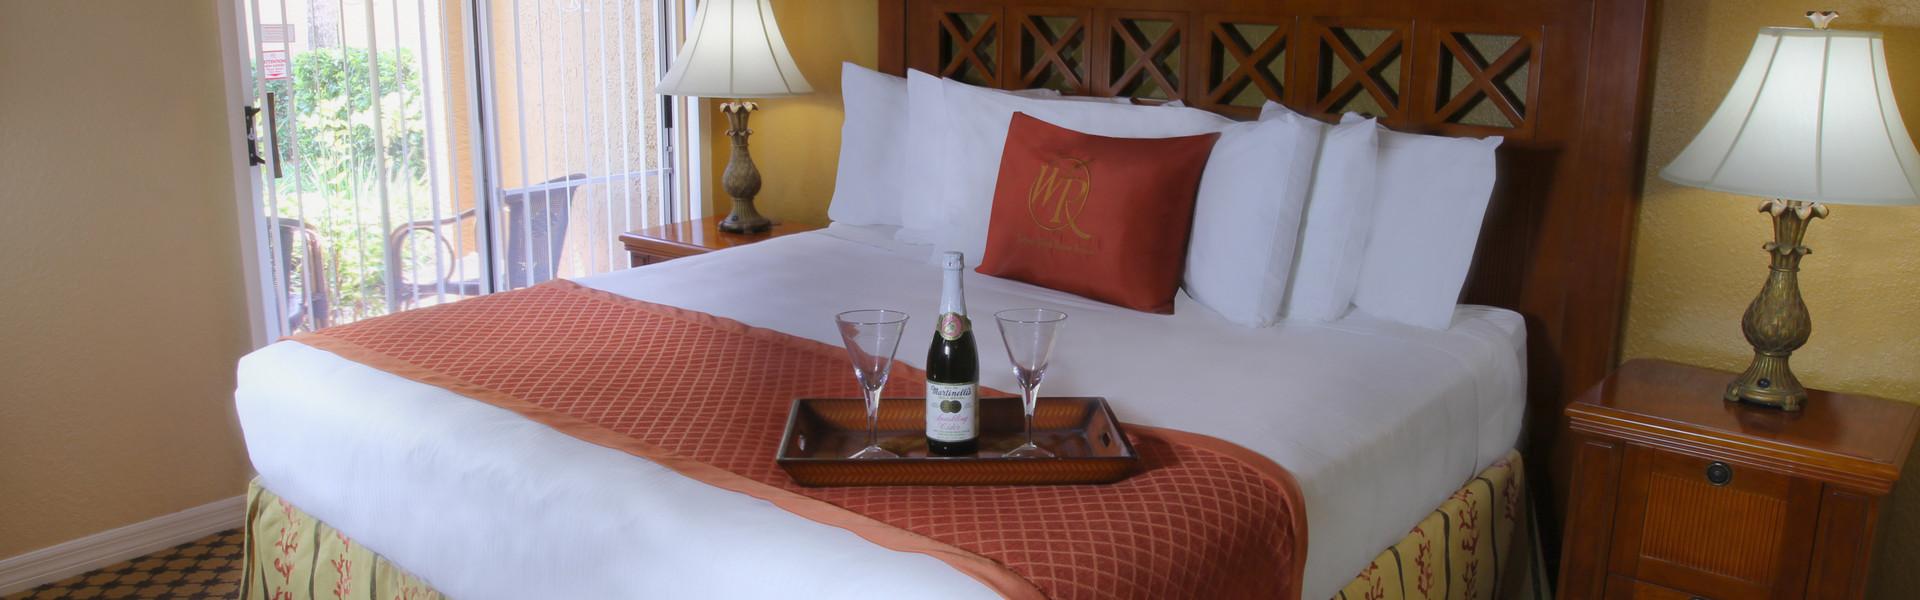 Accommodations in Lake Buena Vista Florida | Resorts Near Sea World in Lake Buena Vista, FL 32836 | Westgate Blue Tree Resort